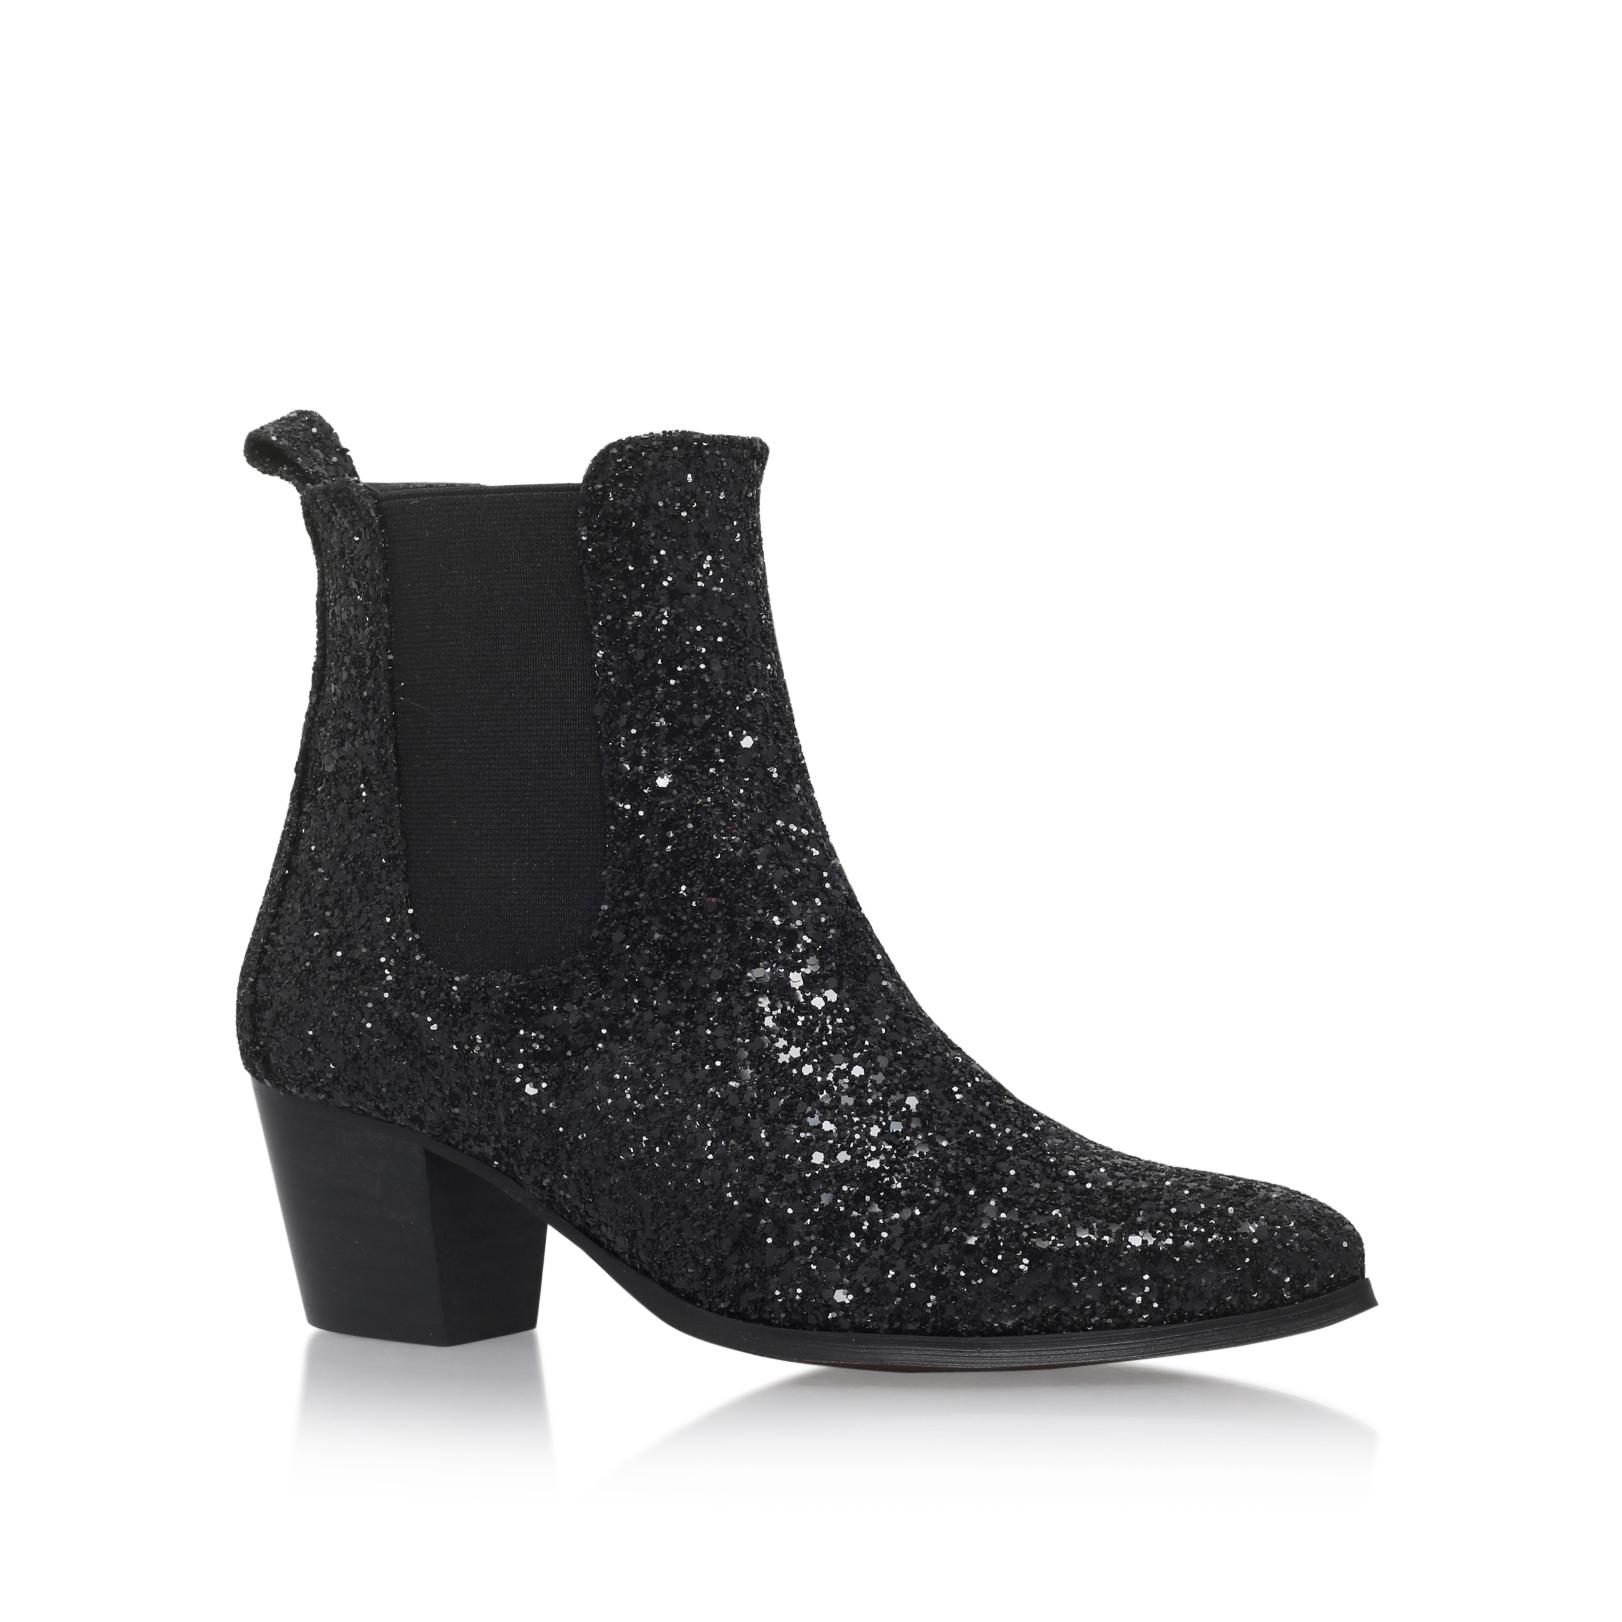 Kurt Geiger Shoes Australia